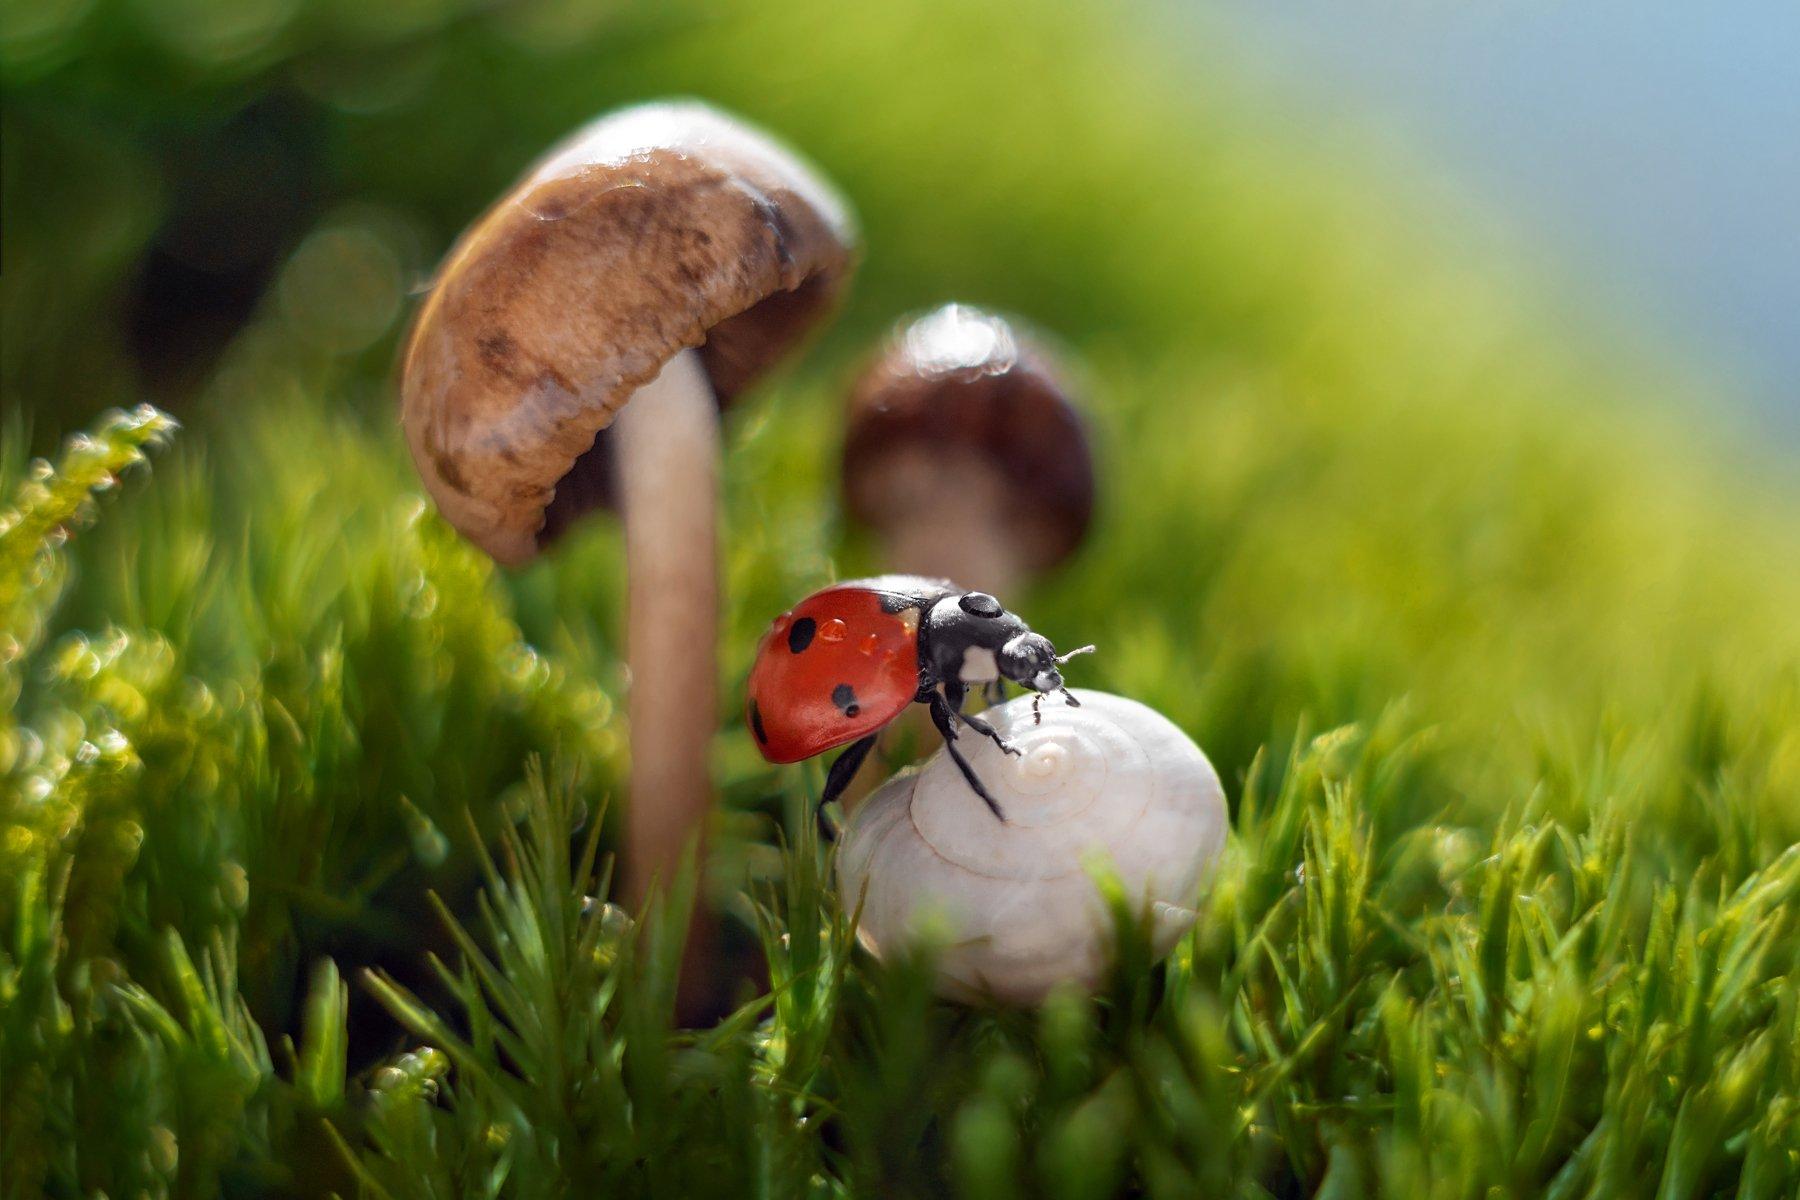 макро, макрофото, улитка, гриб, дождь, лес, природа, капли, никон, сигма, гелиос, macro, macro, snail, mushroom, rain, forest, nature, drops, nikon, sigma, sigma105,, Дегтярёва Анна